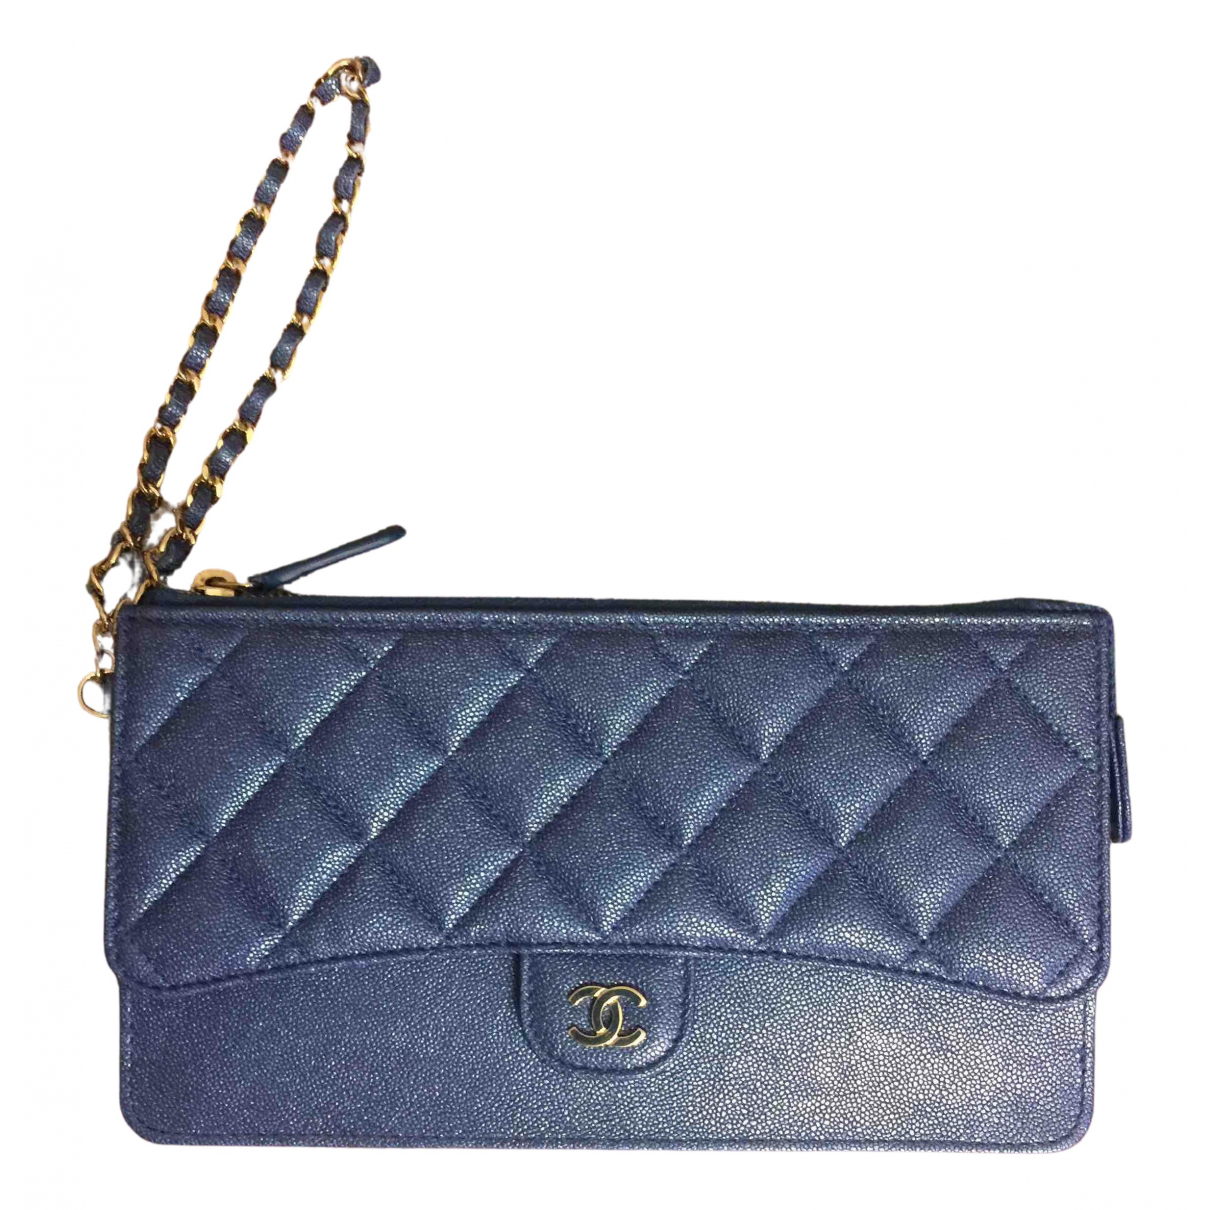 Chanel Timeless/Classique Clutch in  Blau Leder